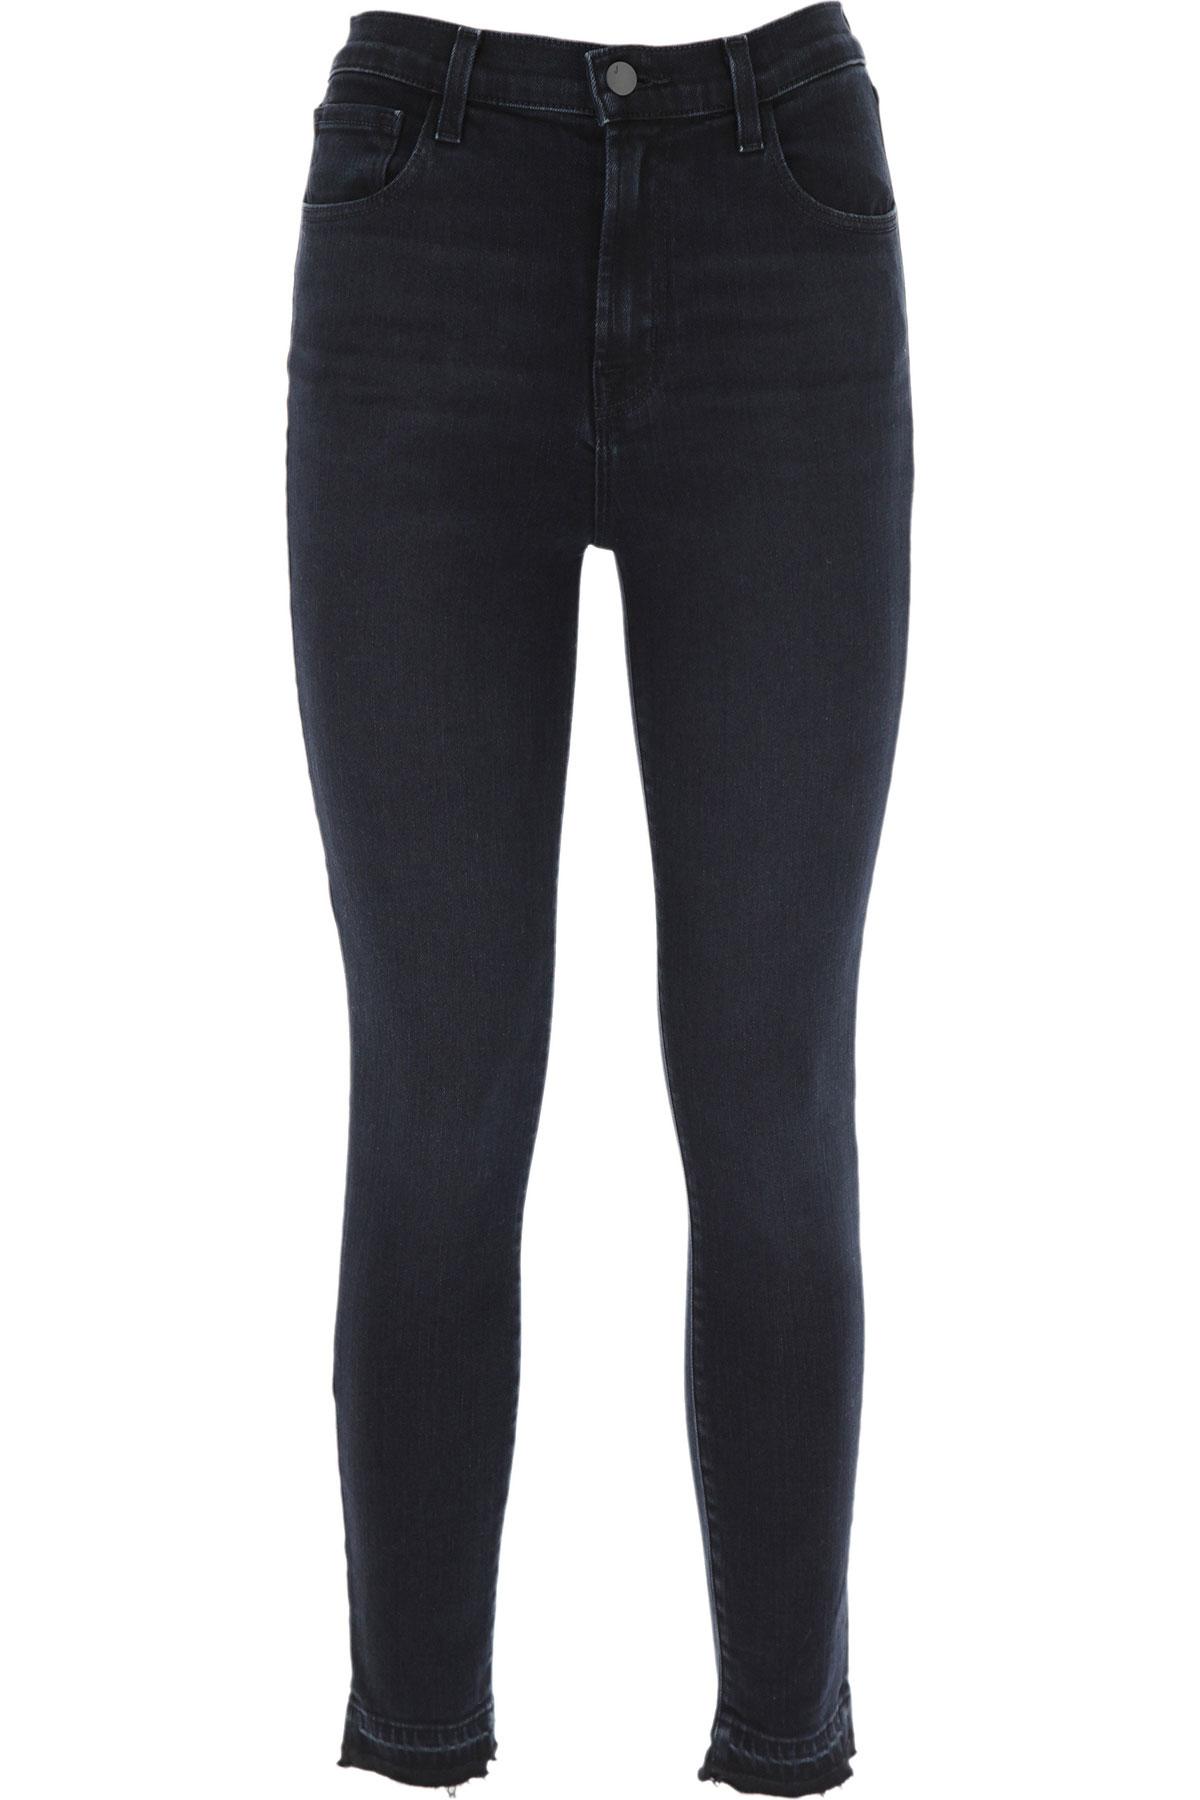 J Brand Womens Clothing On Sale, Blue Black, Cotton, 2019, 25 28 29